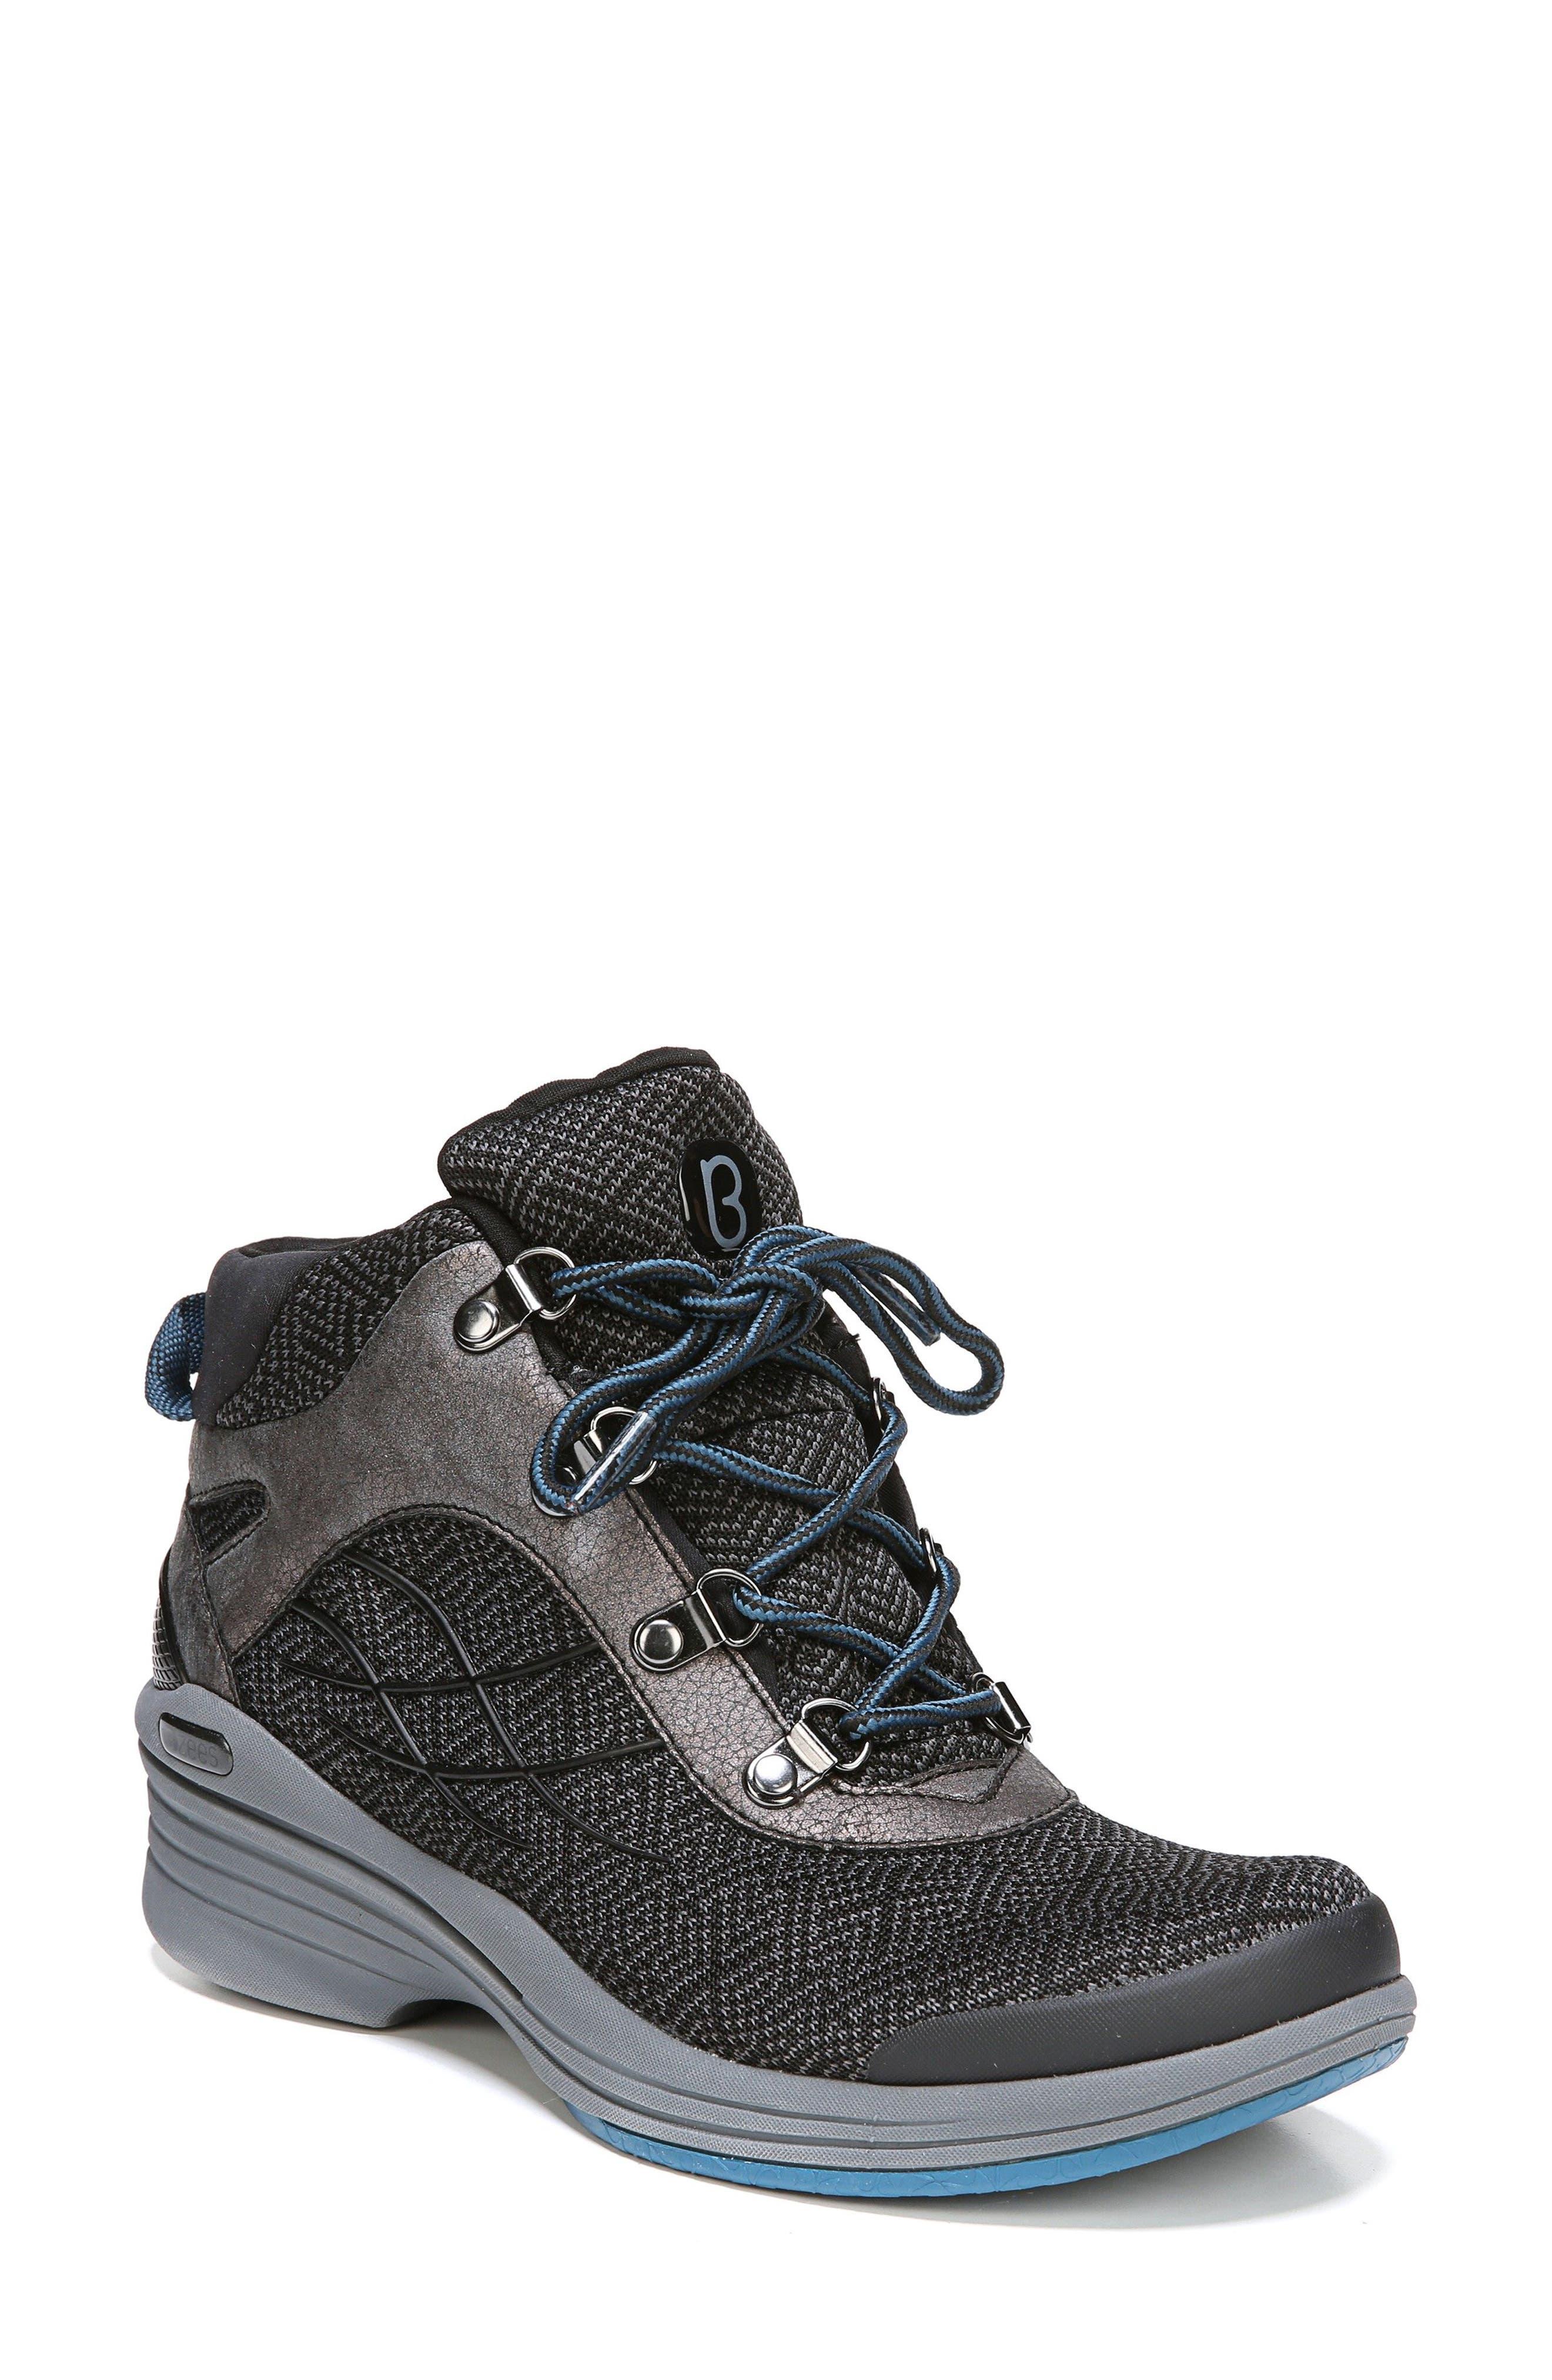 Hotshot Sneaker,                             Main thumbnail 1, color,                             002